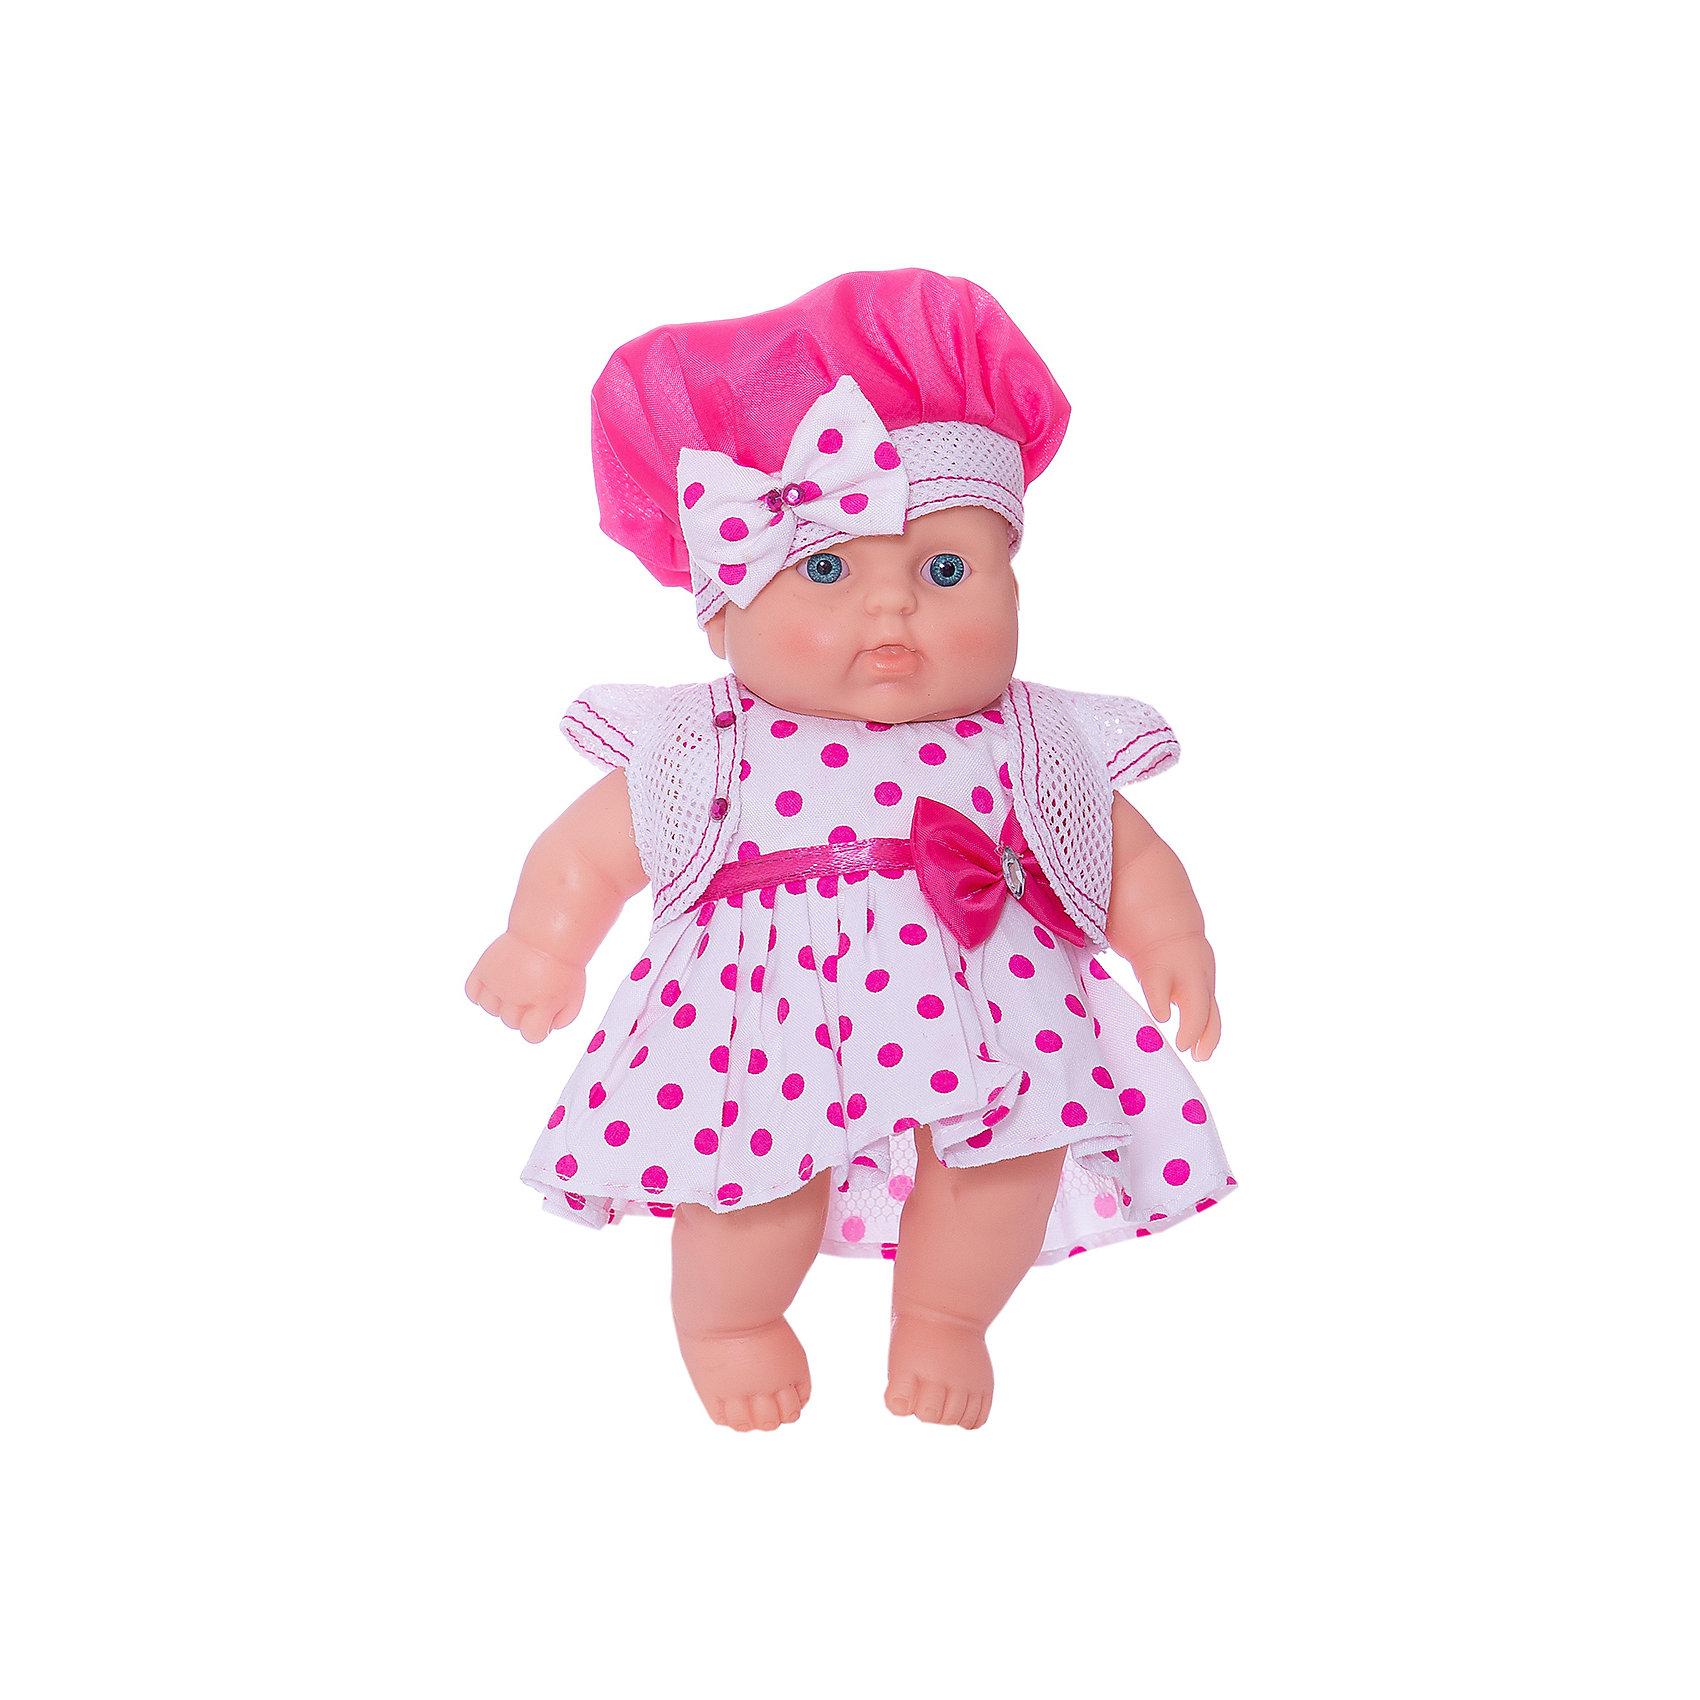 Весна Кукла Карапуз 14 (девочка), 20 см, Весна favourite напольный торшер favourite legend 1869 1f